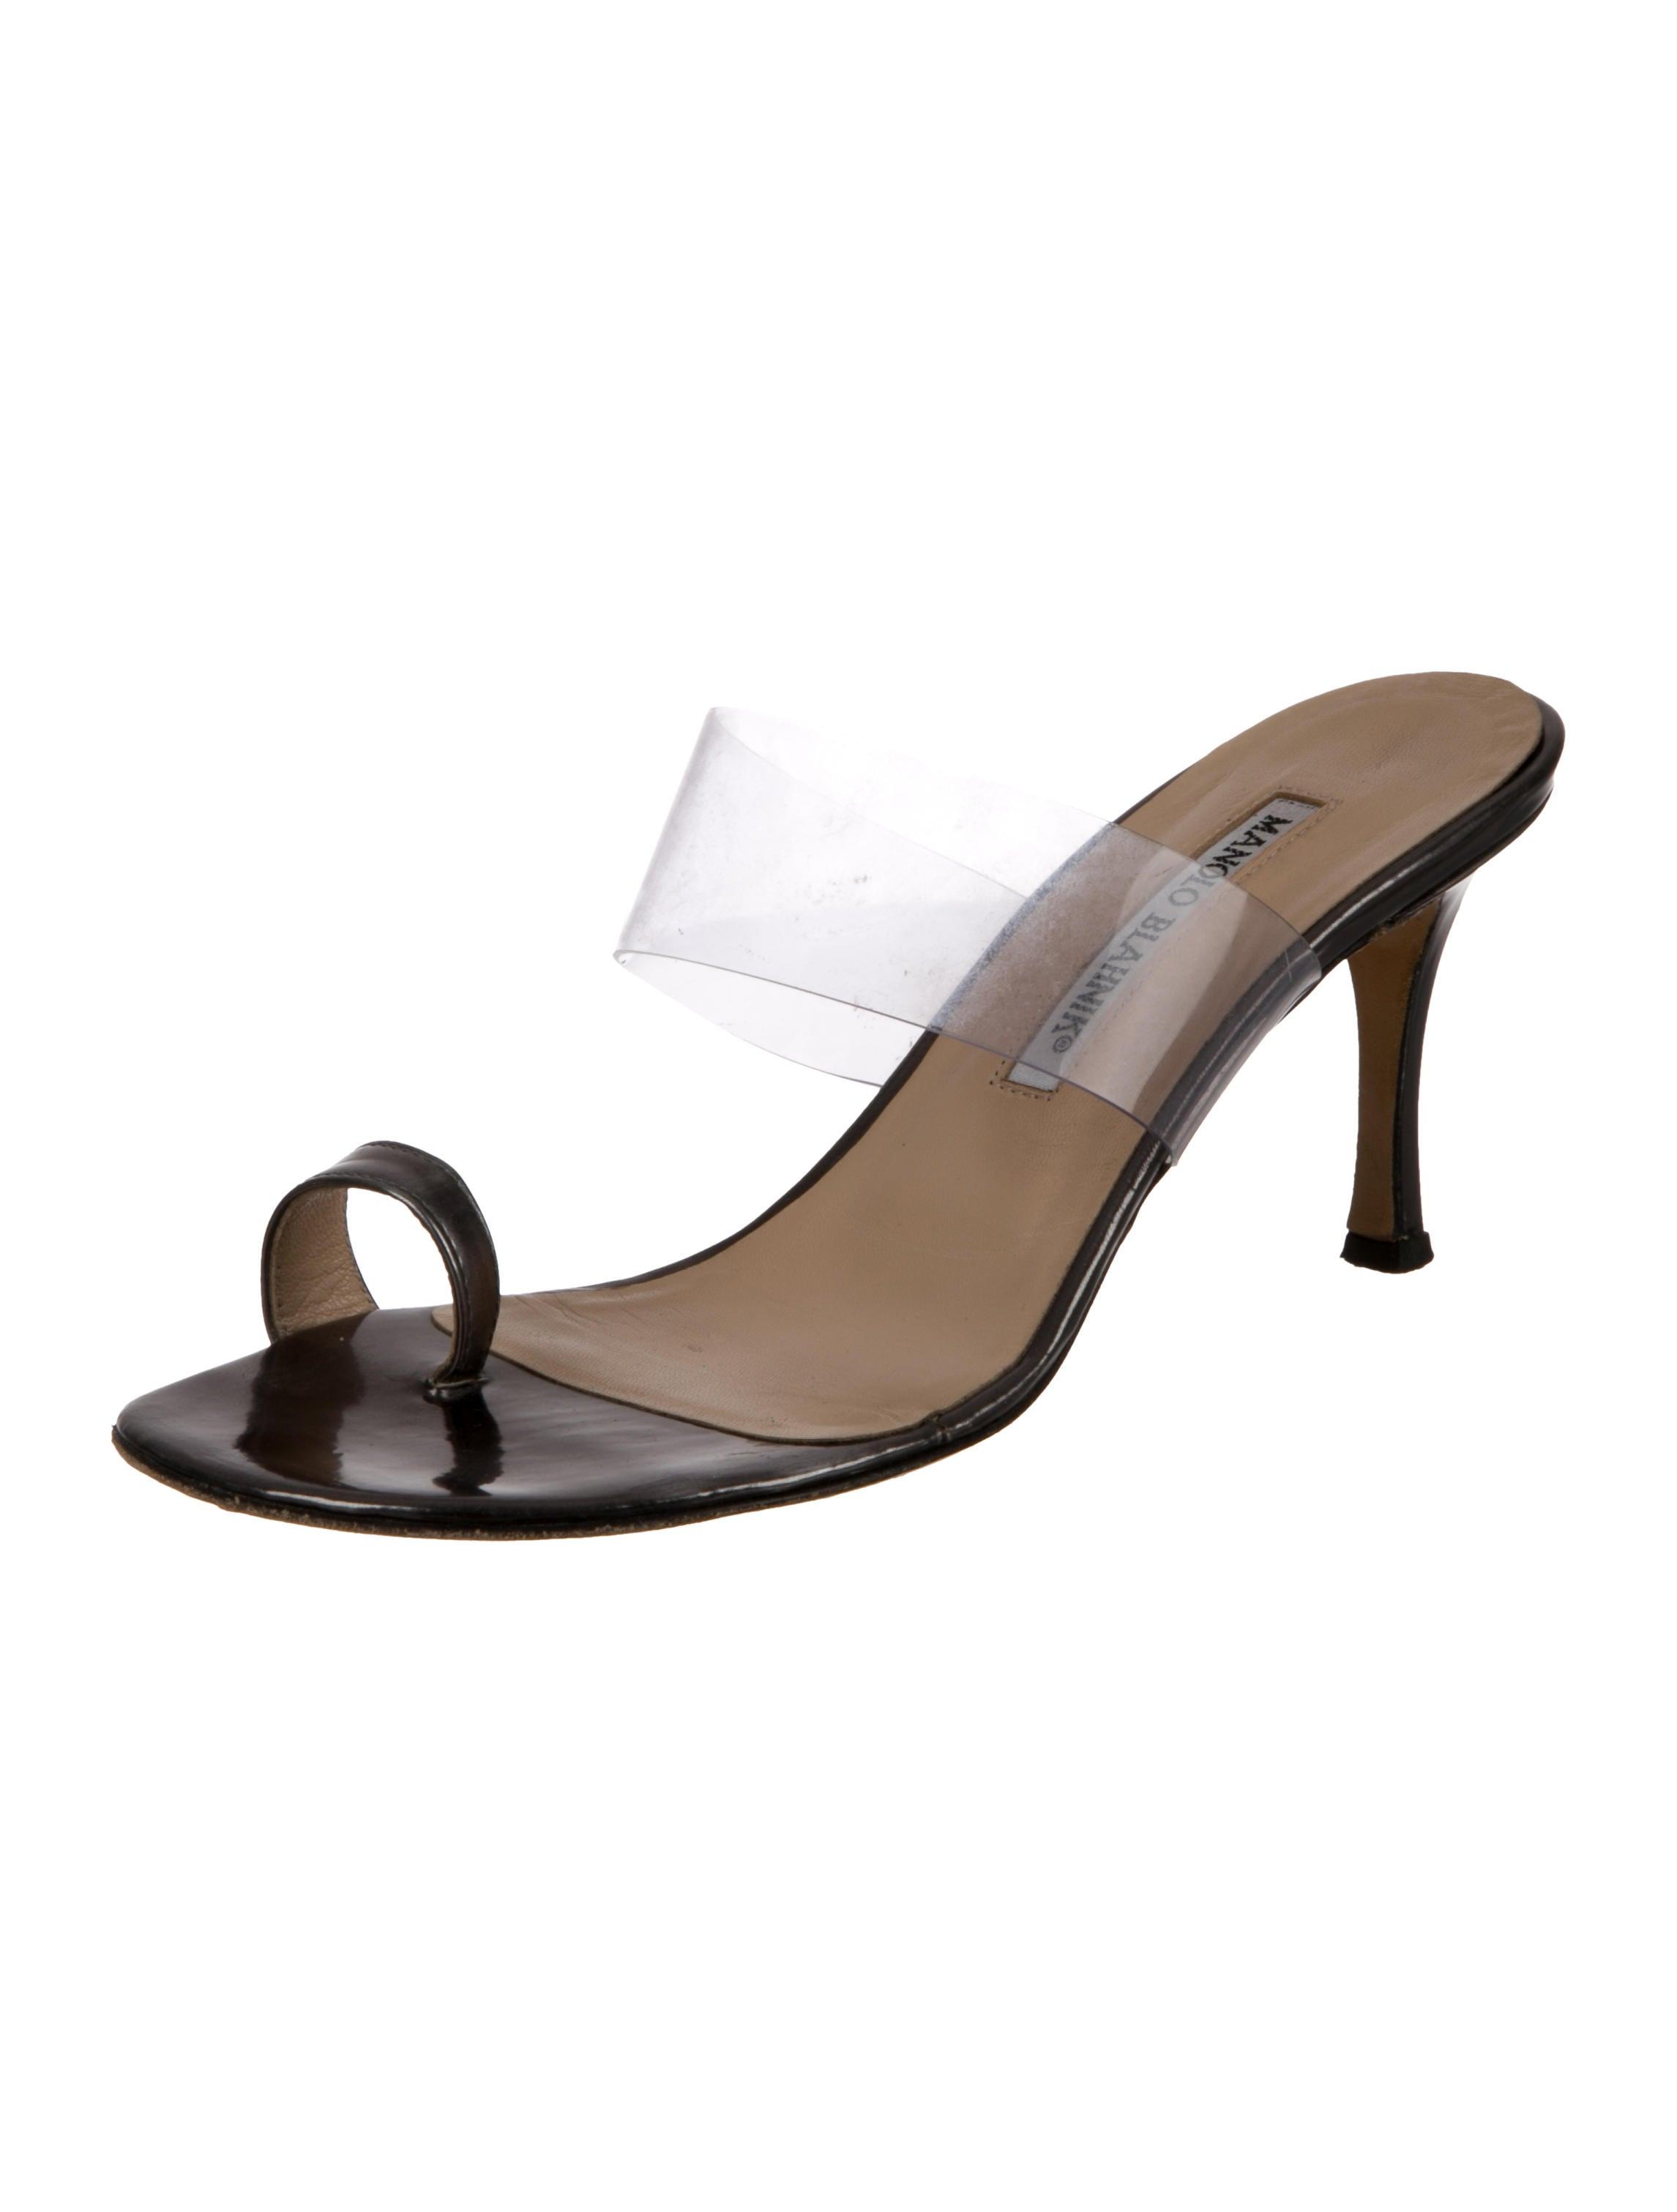 outlet marketable Manolo Blahnik PVC Slide Sandals real cheap price outlet locations cheap price 2J8G3m